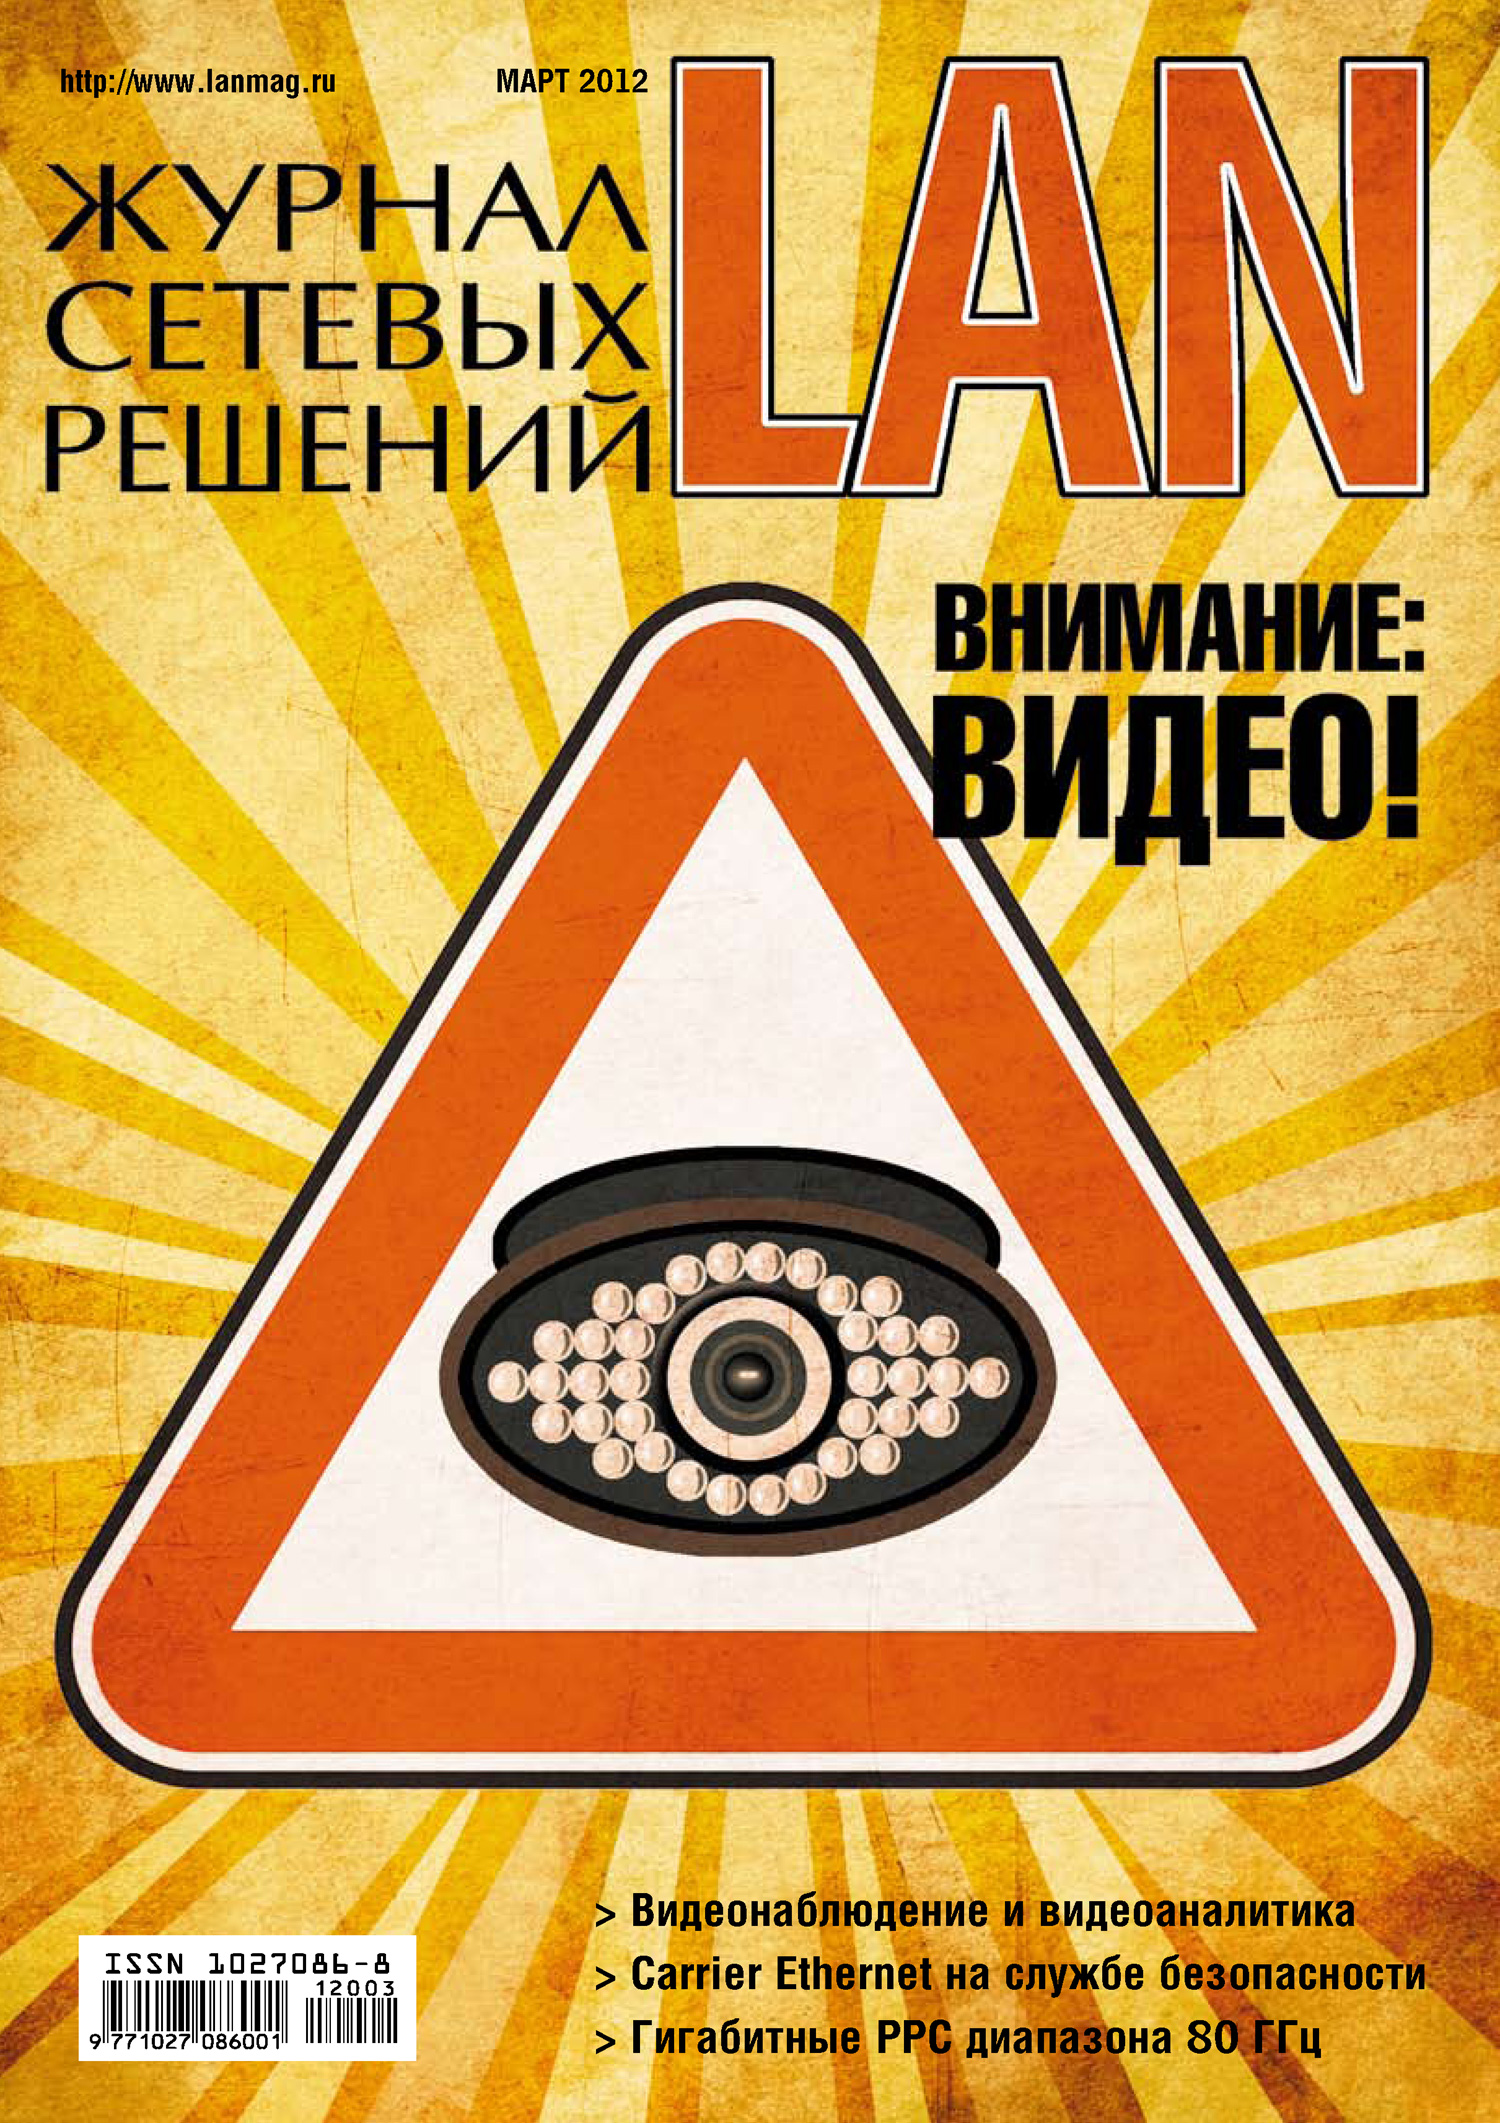 Журнал сетевых решений / LAN №03/2012